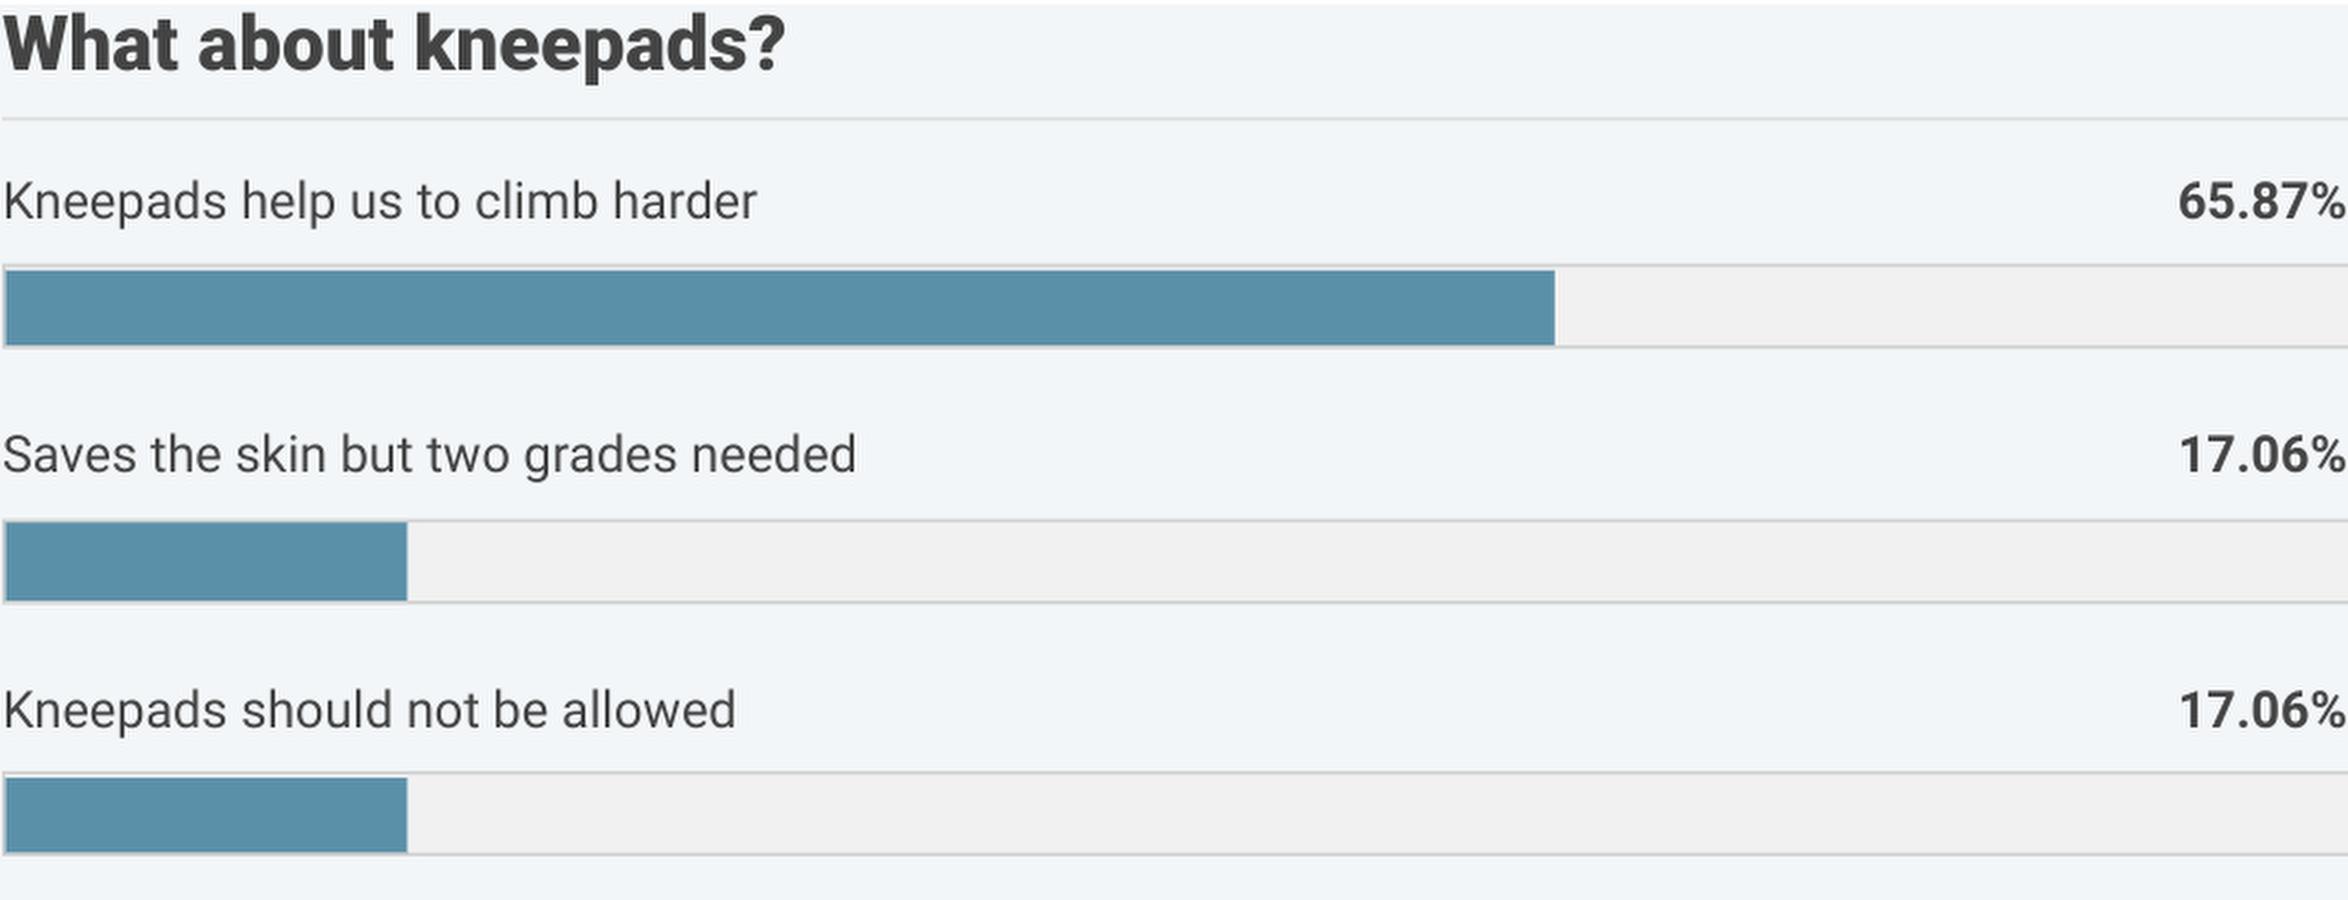 Europeans more negative towards kneepads